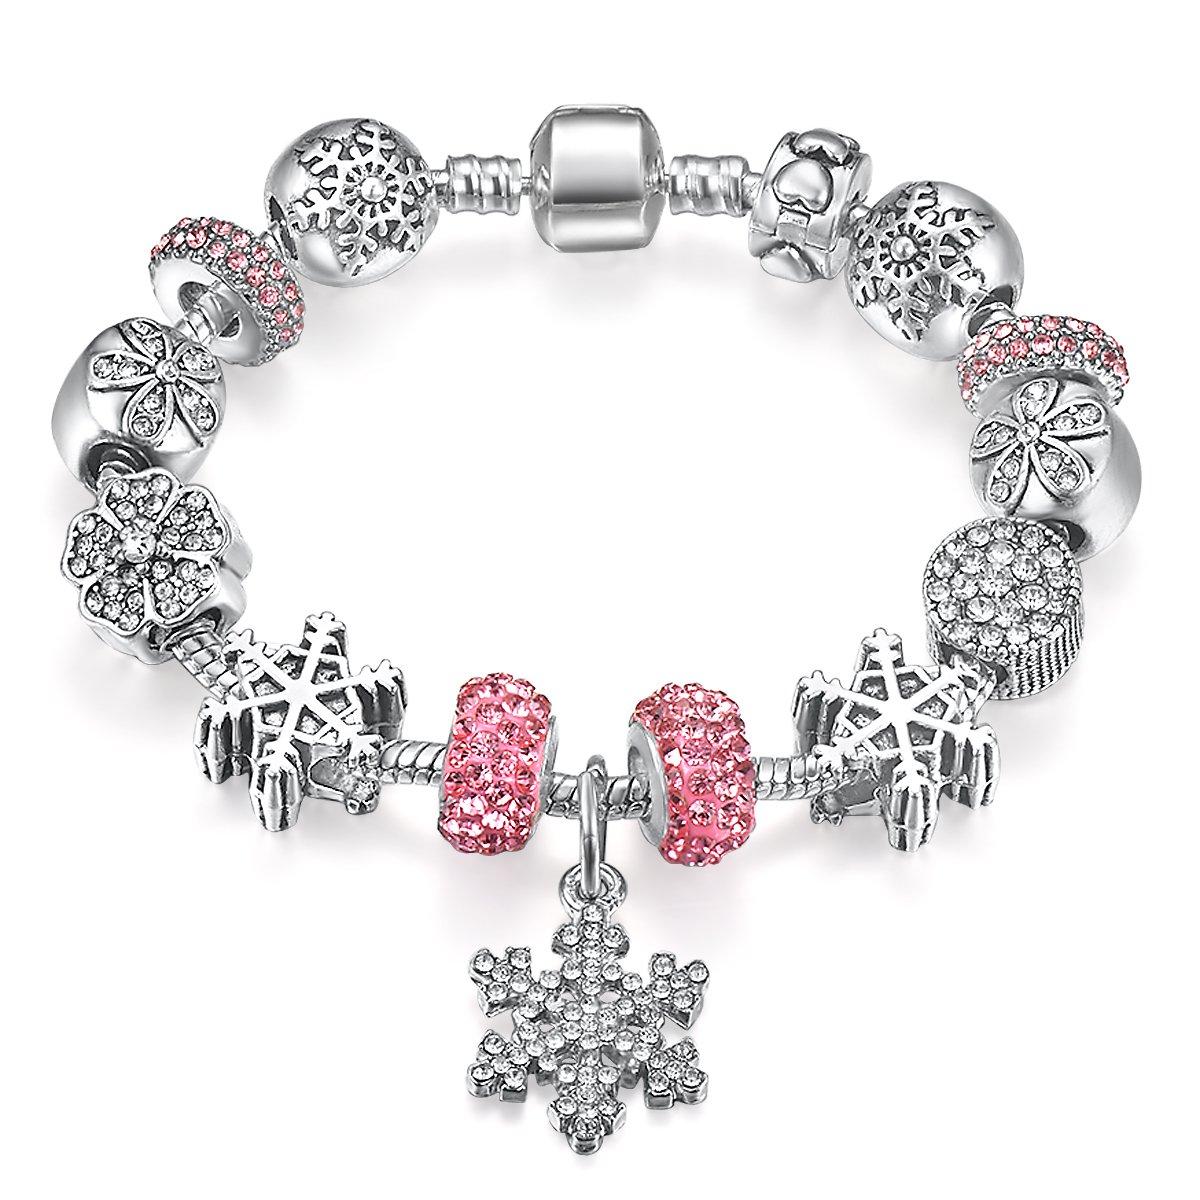 Presentski Silver Plate Charm Bracelet with Four Leaf Clover HB06-18